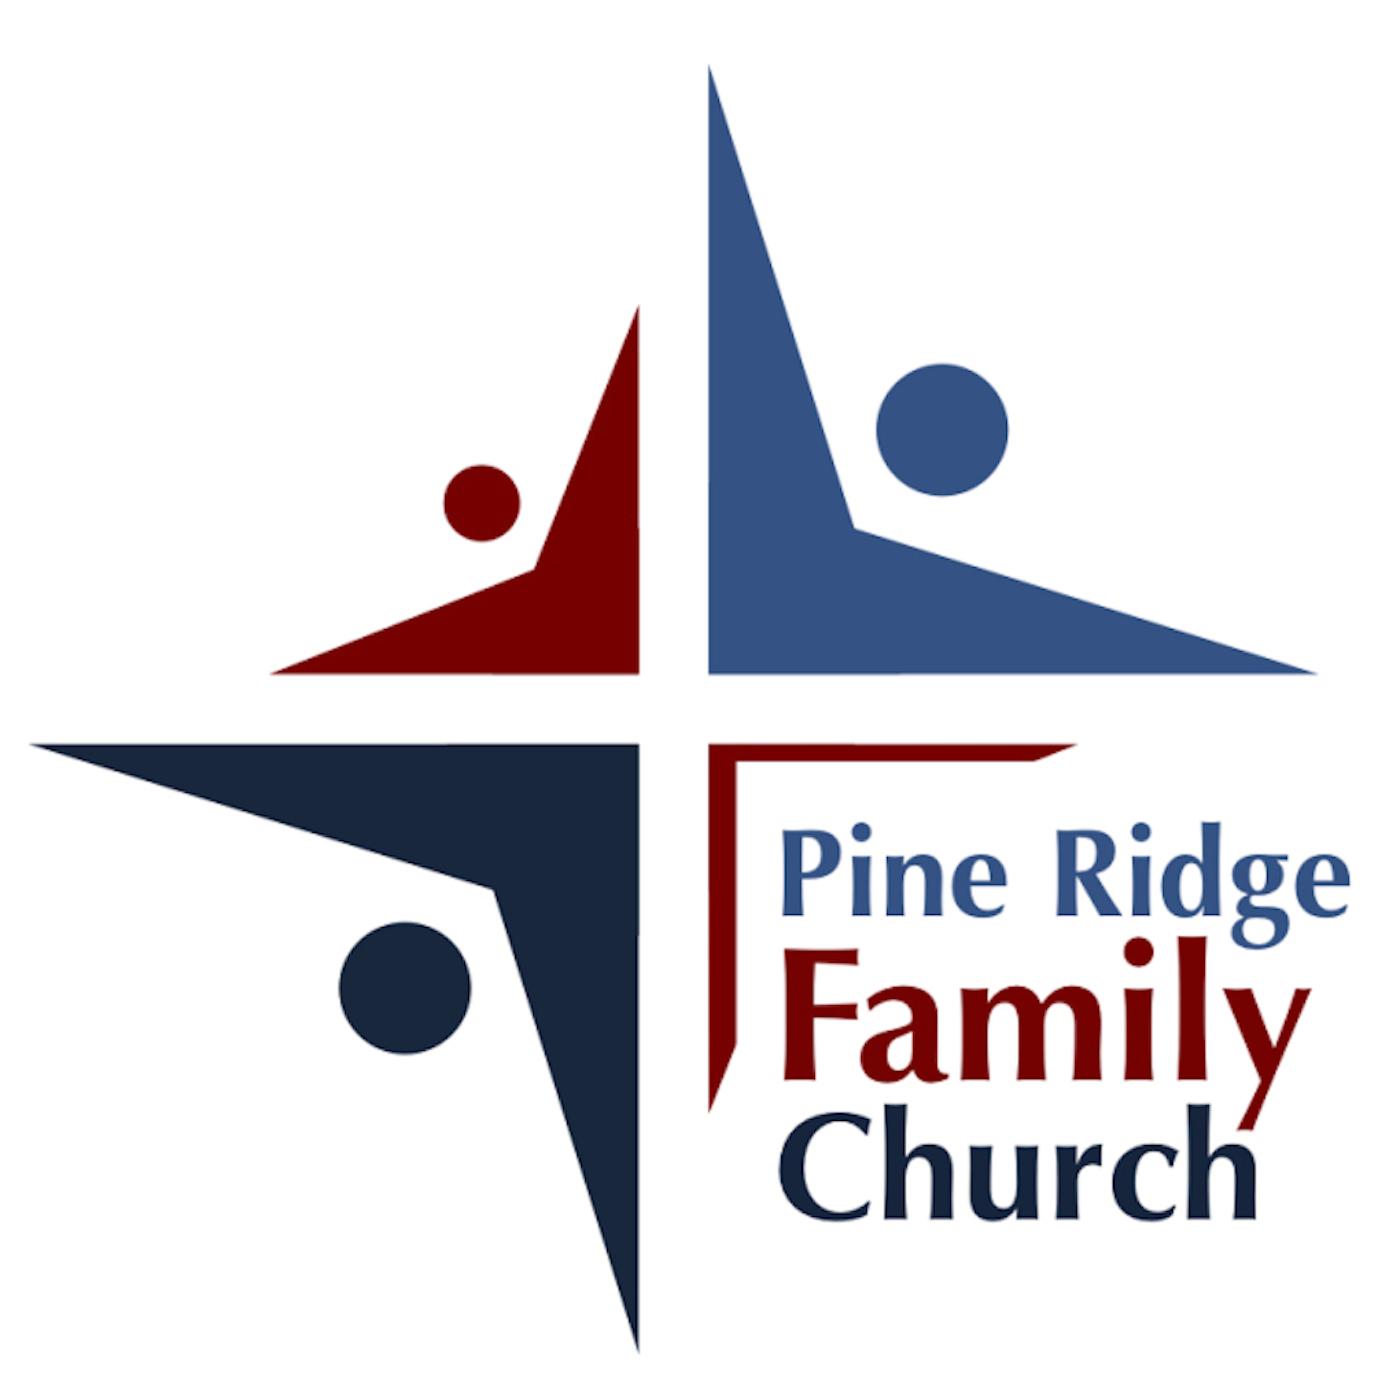 Pine Ridge Family Church